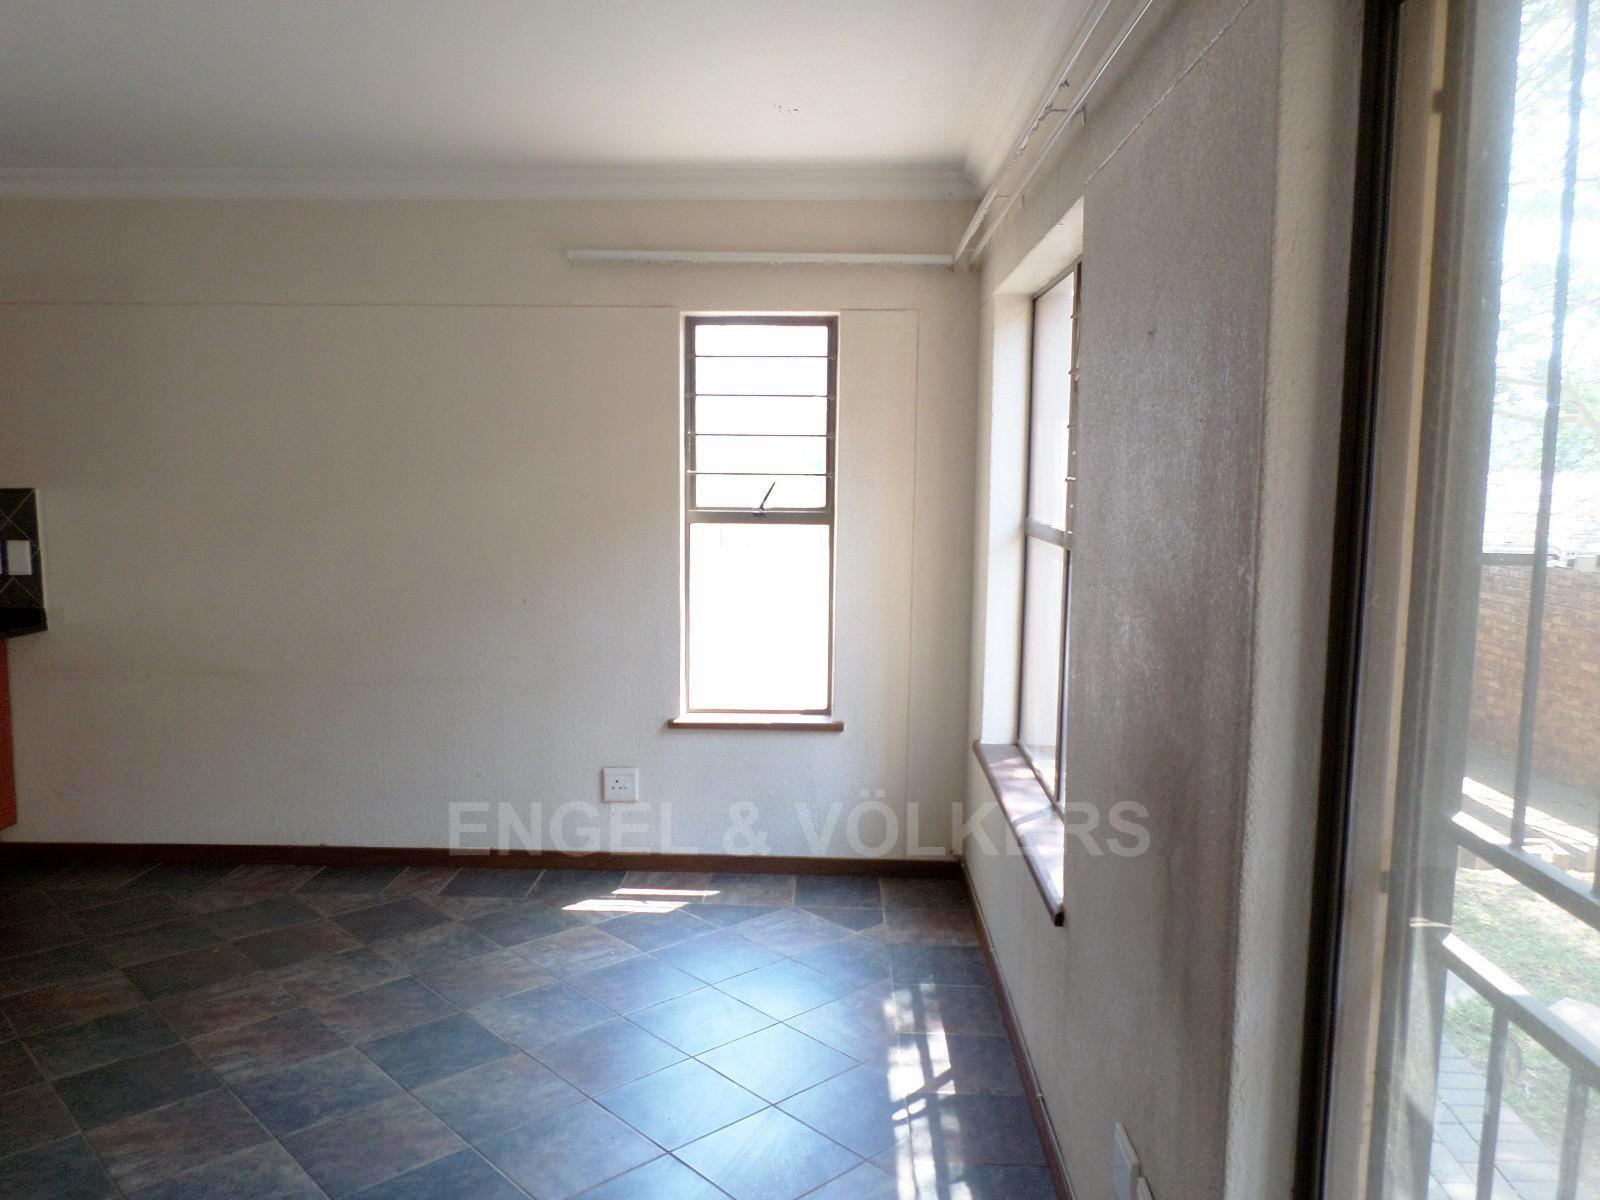 Hatfield property for sale. Ref No: 13259219. Picture no 3